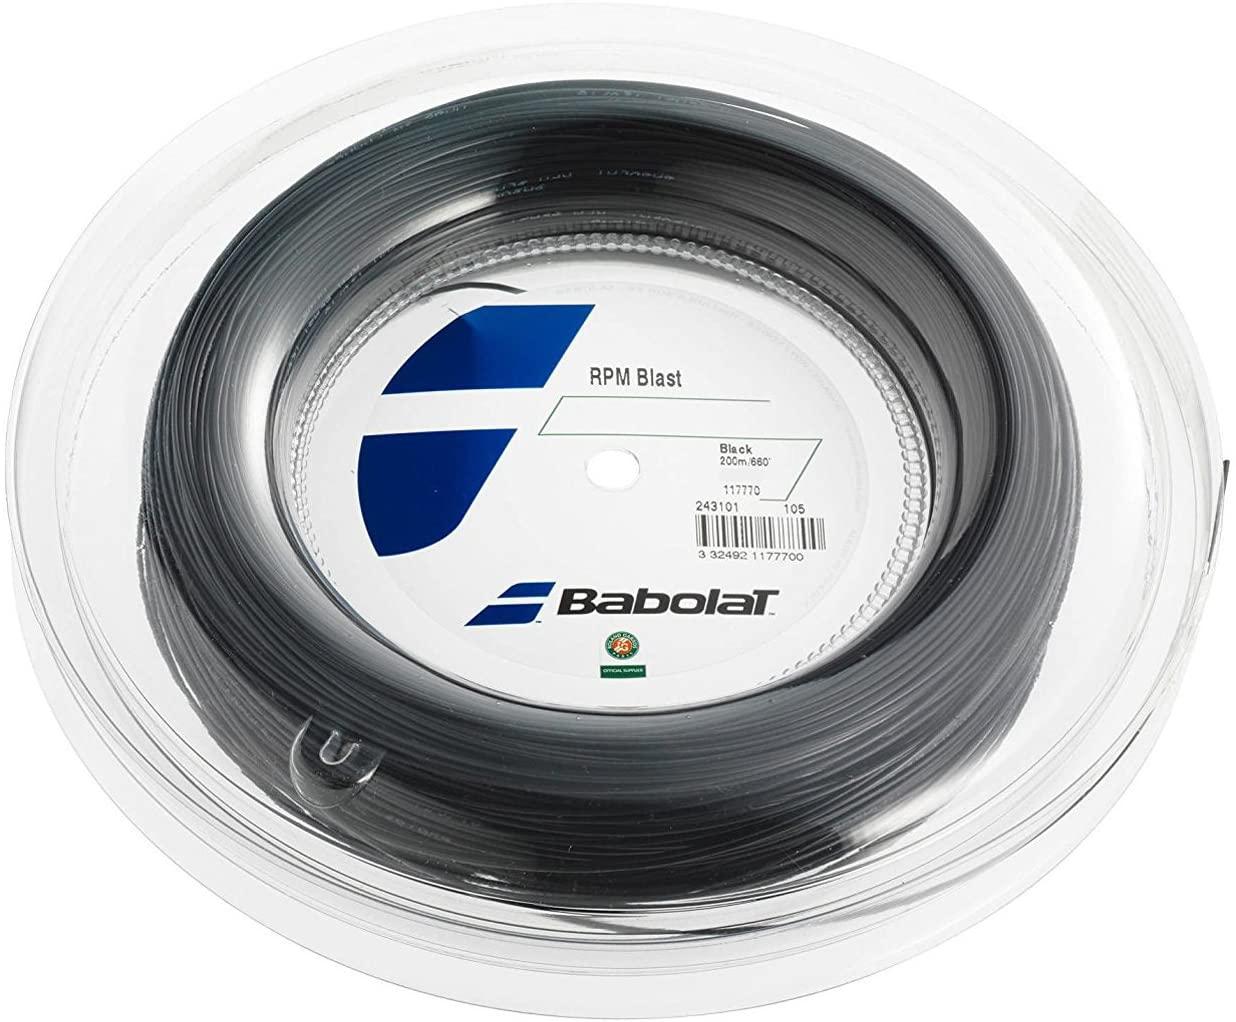 Babolat RPM Blast 200m 1,30mm Tennis String